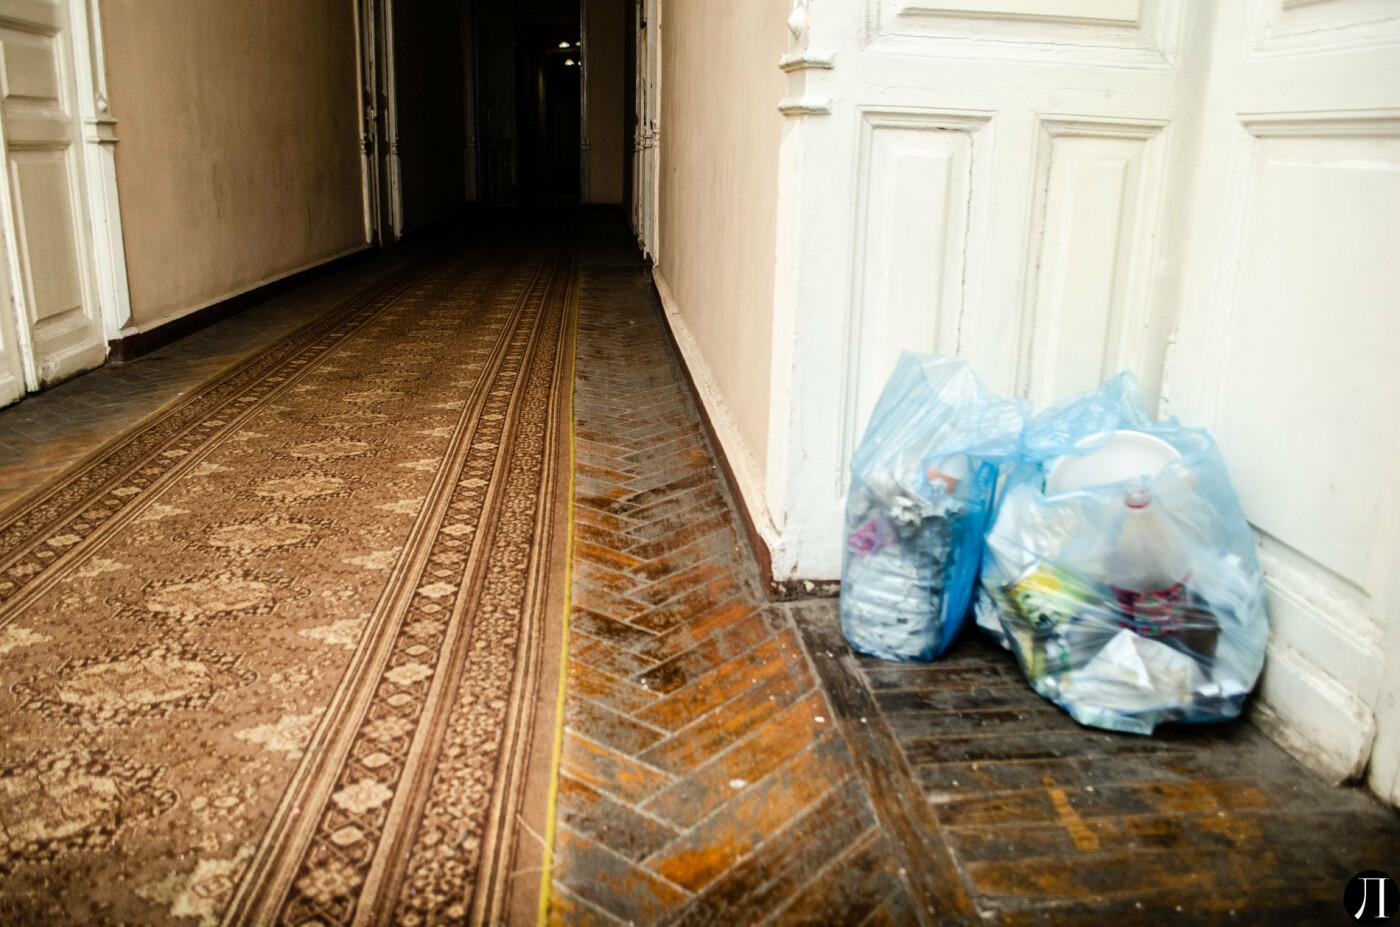 Памятник архитектуры в центре Одессы превратили в общежитие, - ФОТО, фото-1, Фото: Лоция